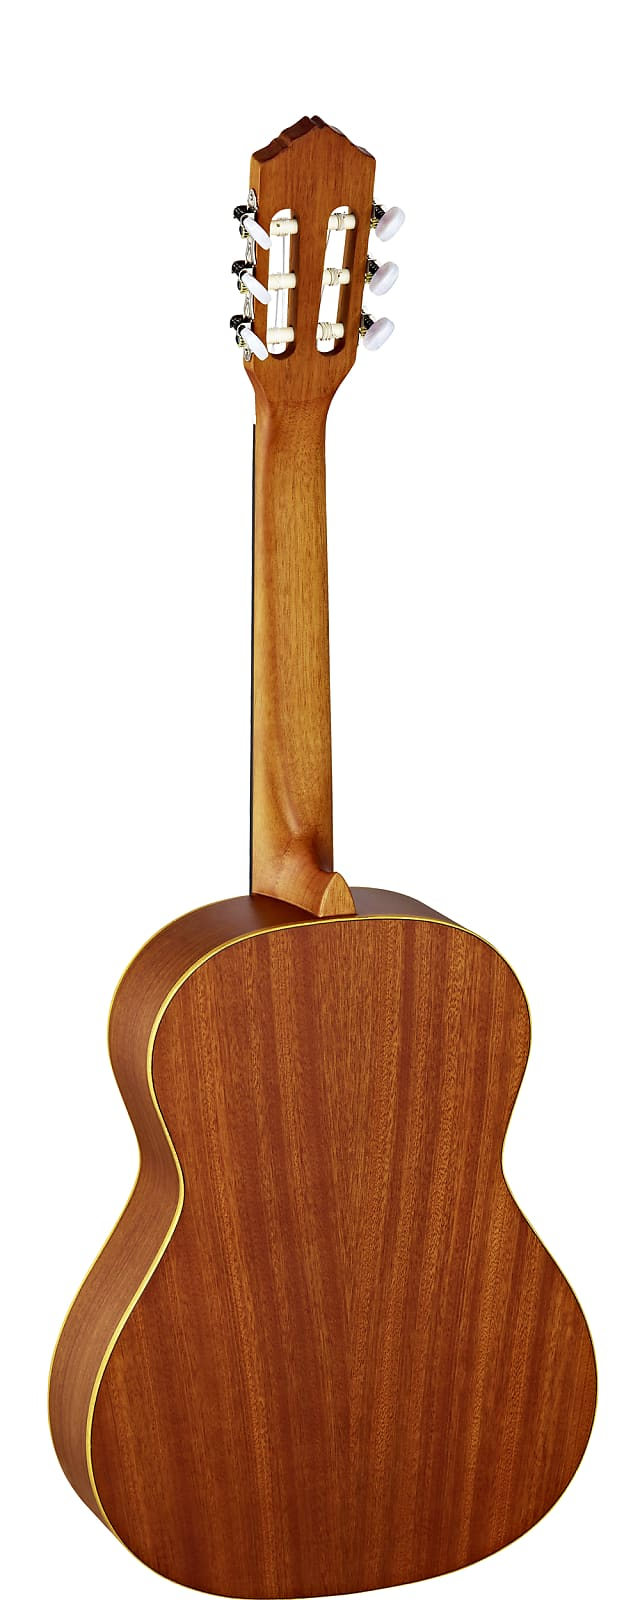 Ortega Family Series 3/4 Size Cedar Top Nylon String Acoustic Guitar R122-3/4